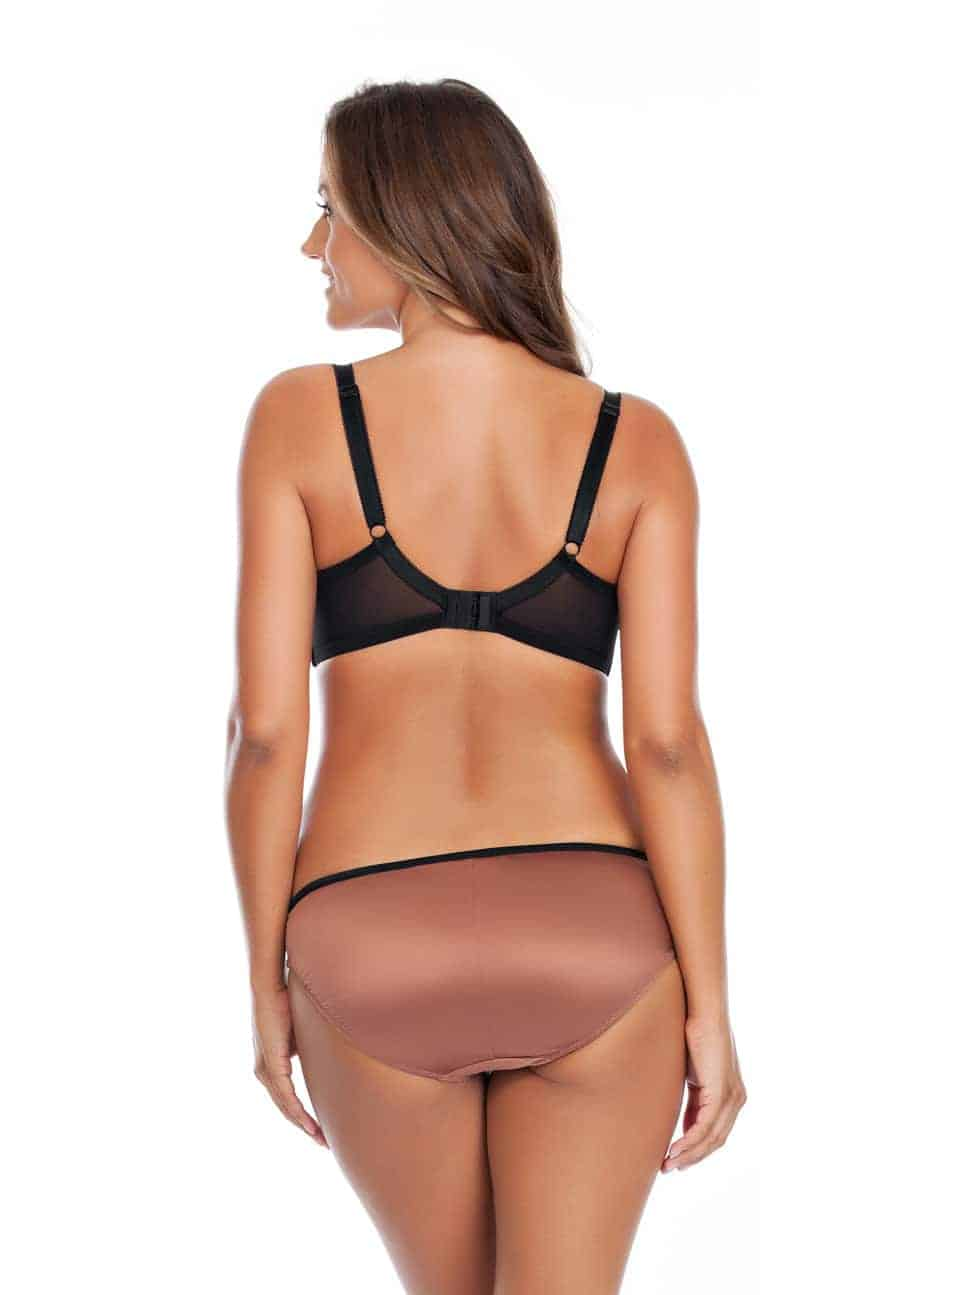 Charlotte PaddedBra6901 Bikini6905 Bronze Back - Charlotte Bikini - Bronze - 6905